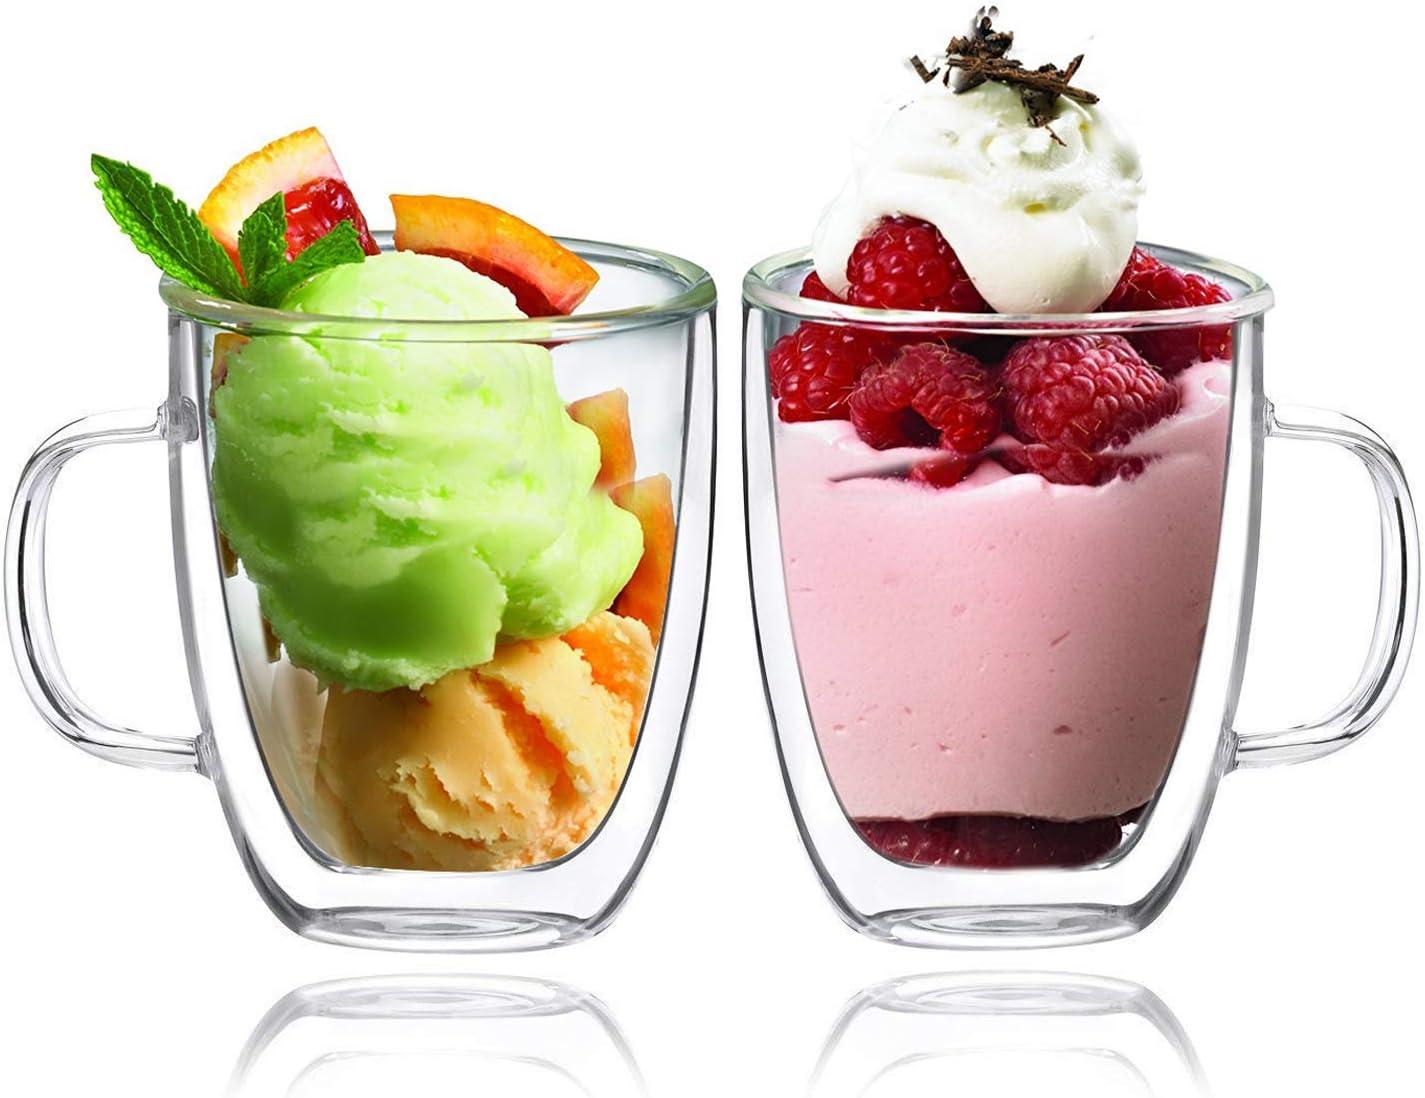 BOQO Tazas de Vidrio Doble Pared, Taza de Cristal con Mango,350ml Juego de 2